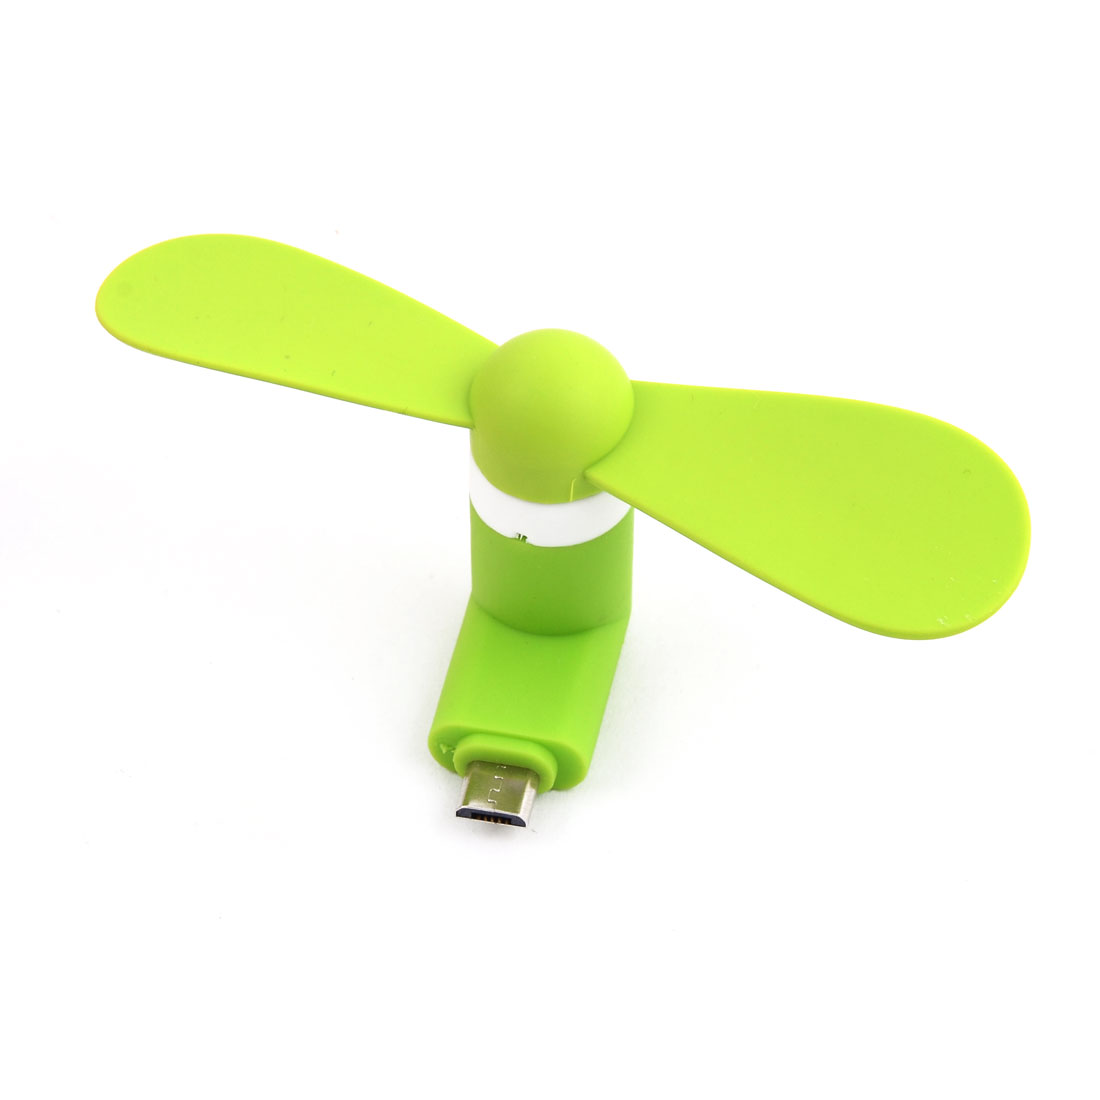 USB Mute 5Pin Portable Summer Cooler USB-Powered Mini Micro Phone Fan Light Green